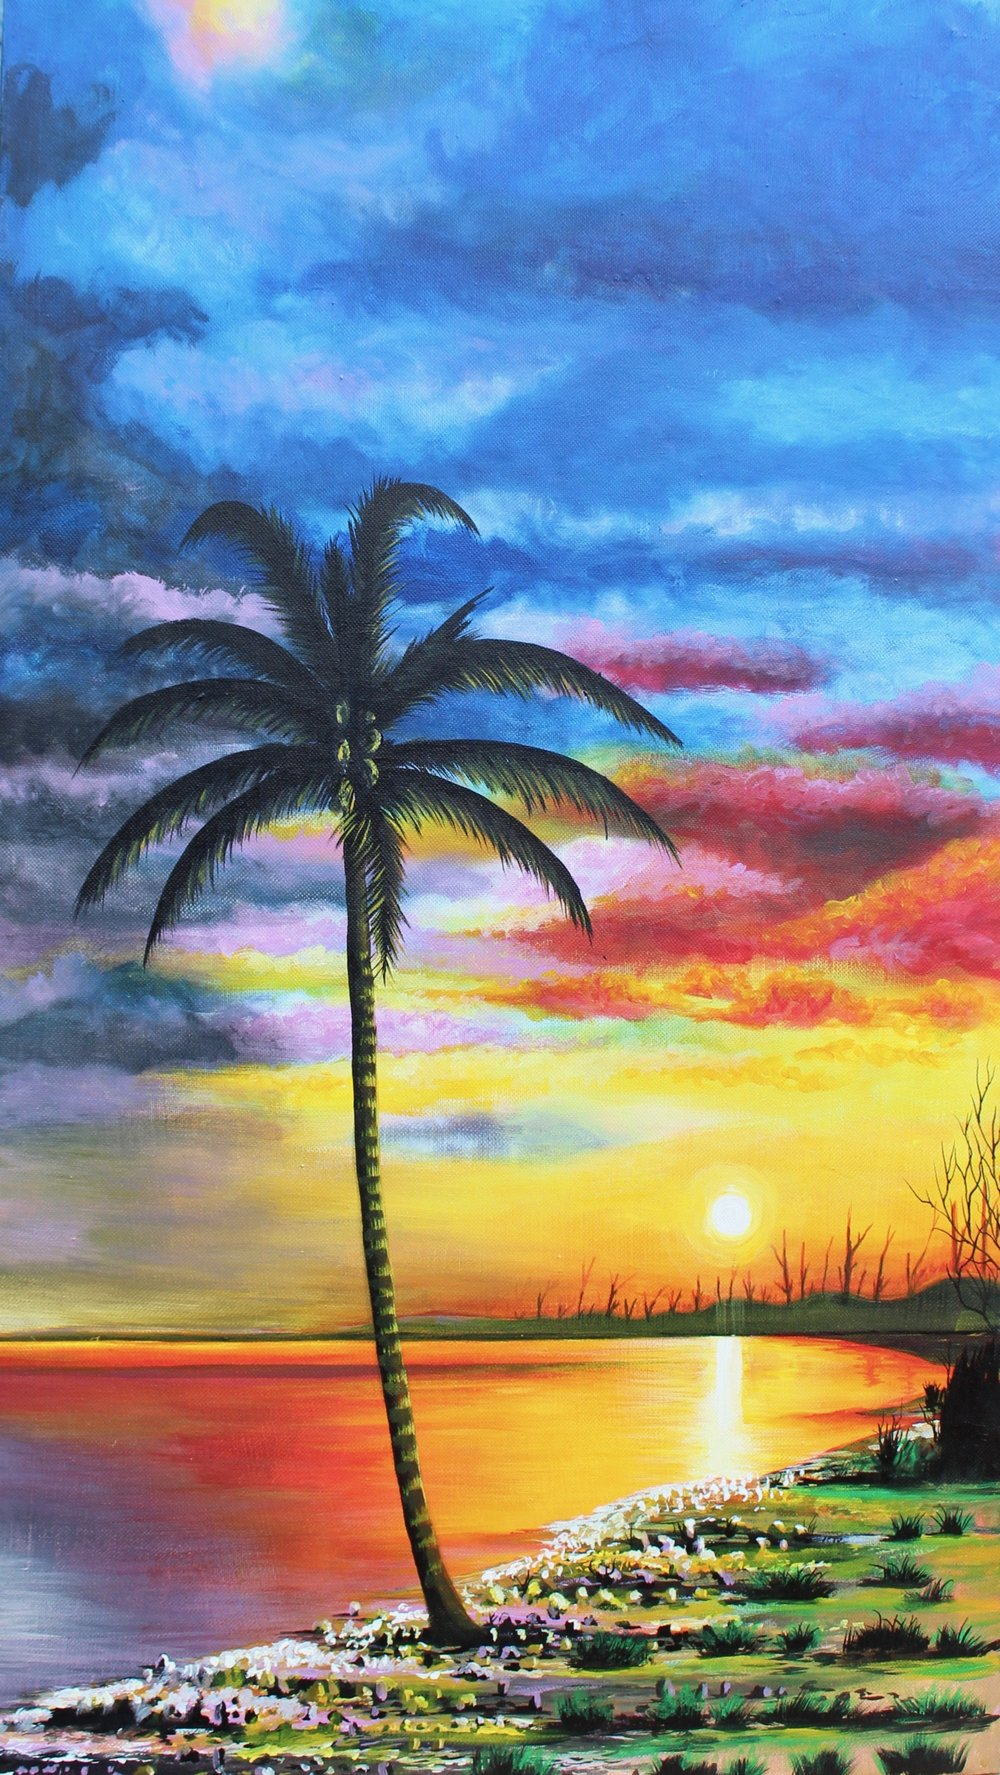 Beach at Sunset.jpg